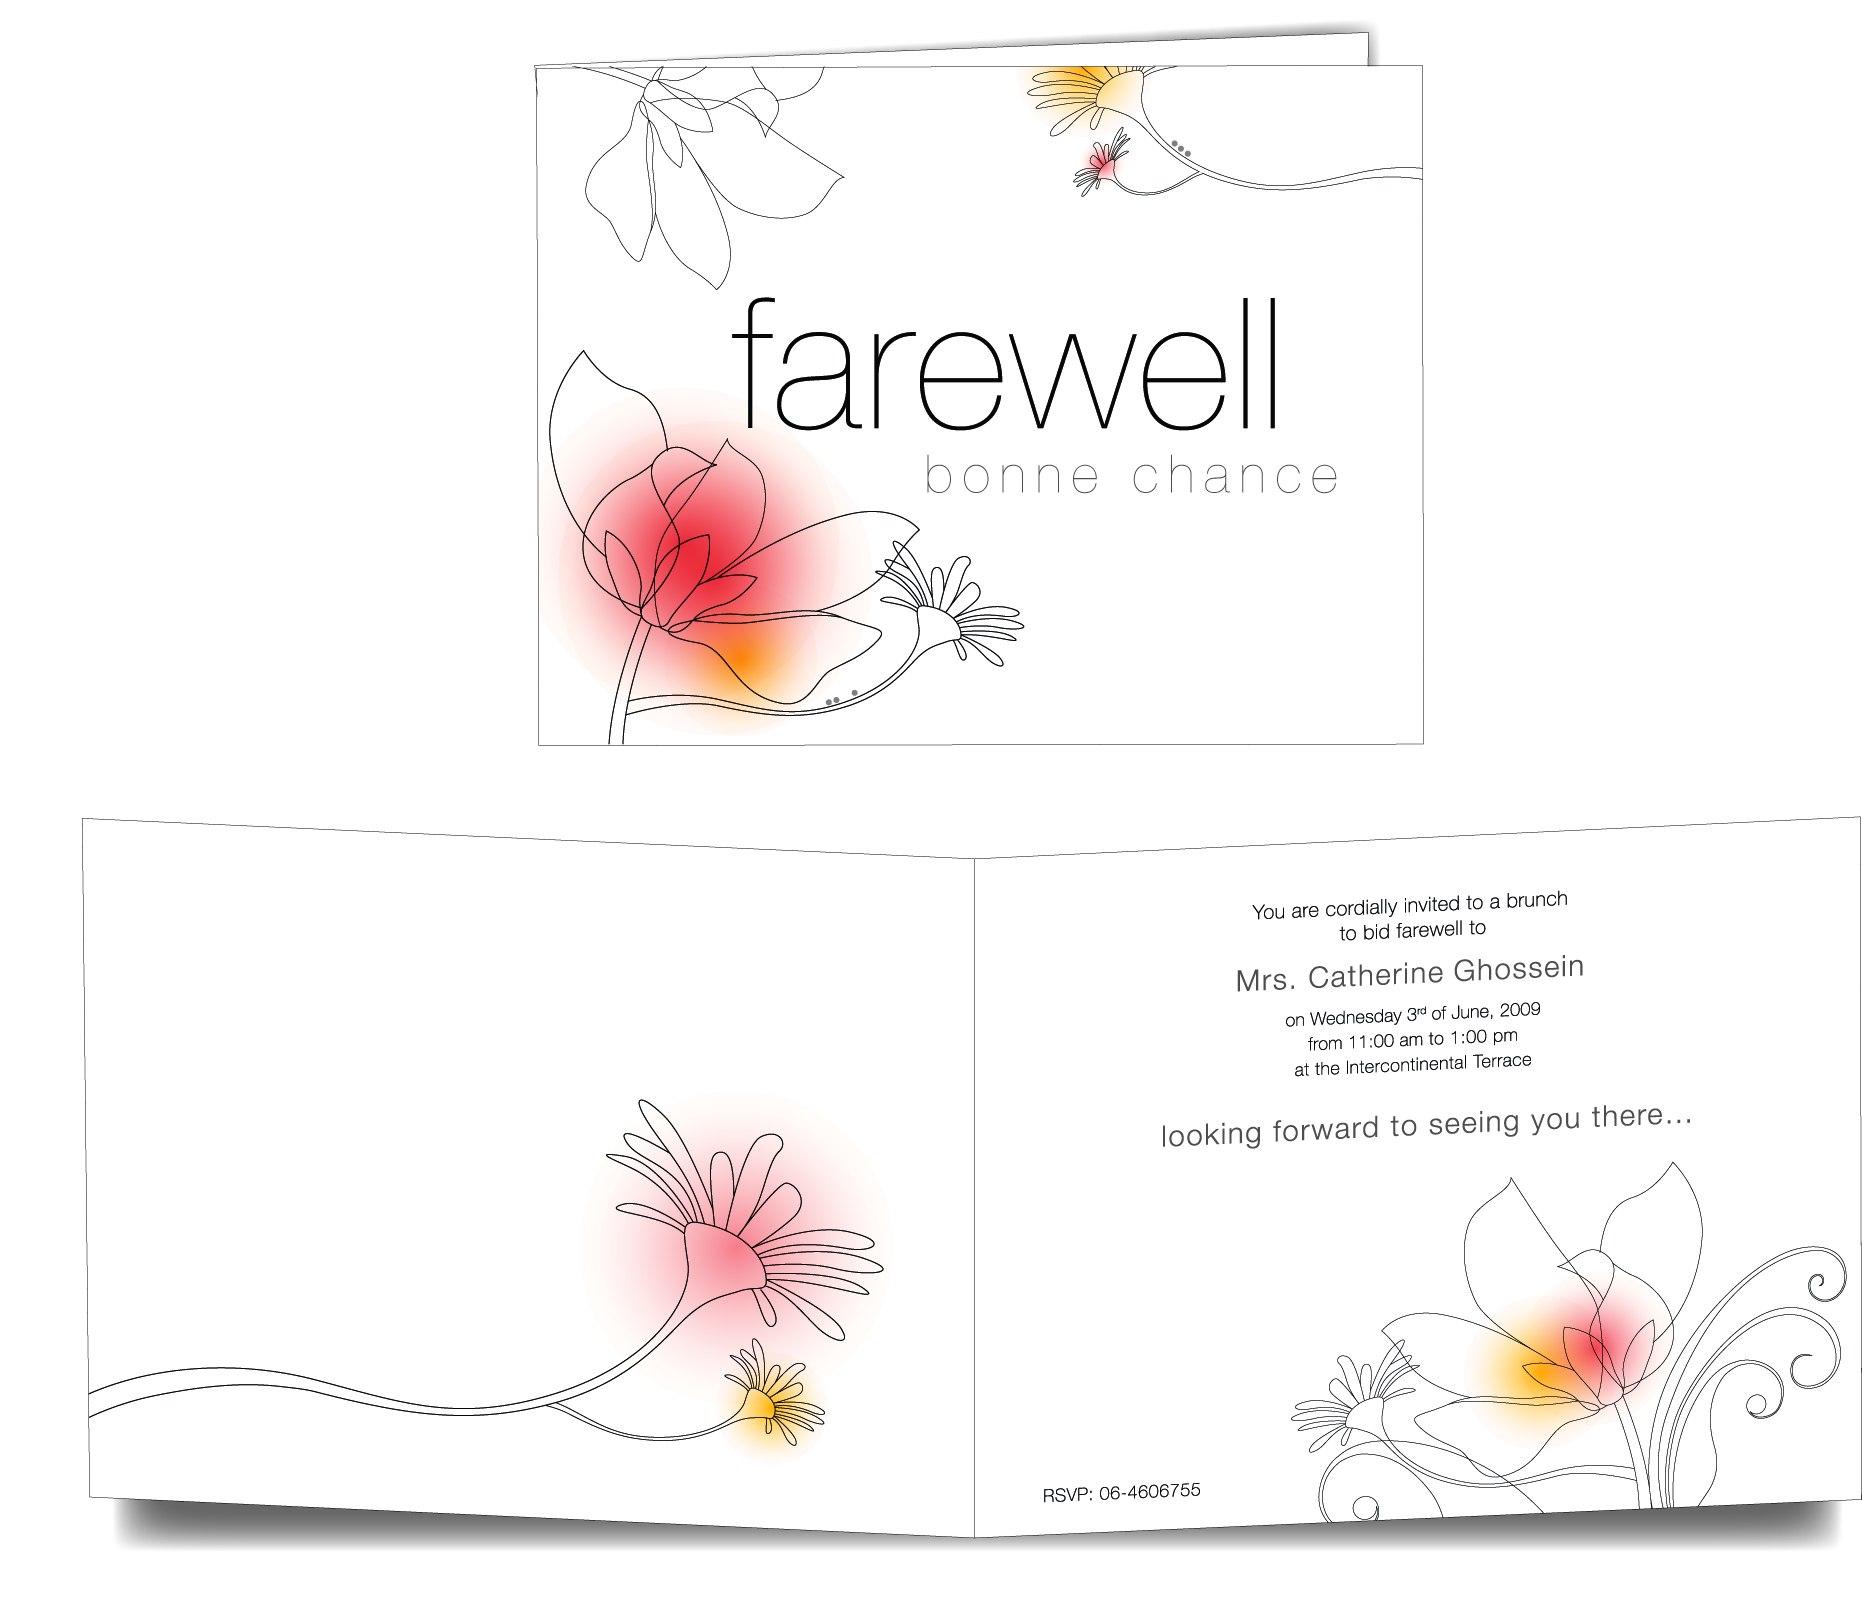 Farewell Design Card – Template For Farewell Card Template Word